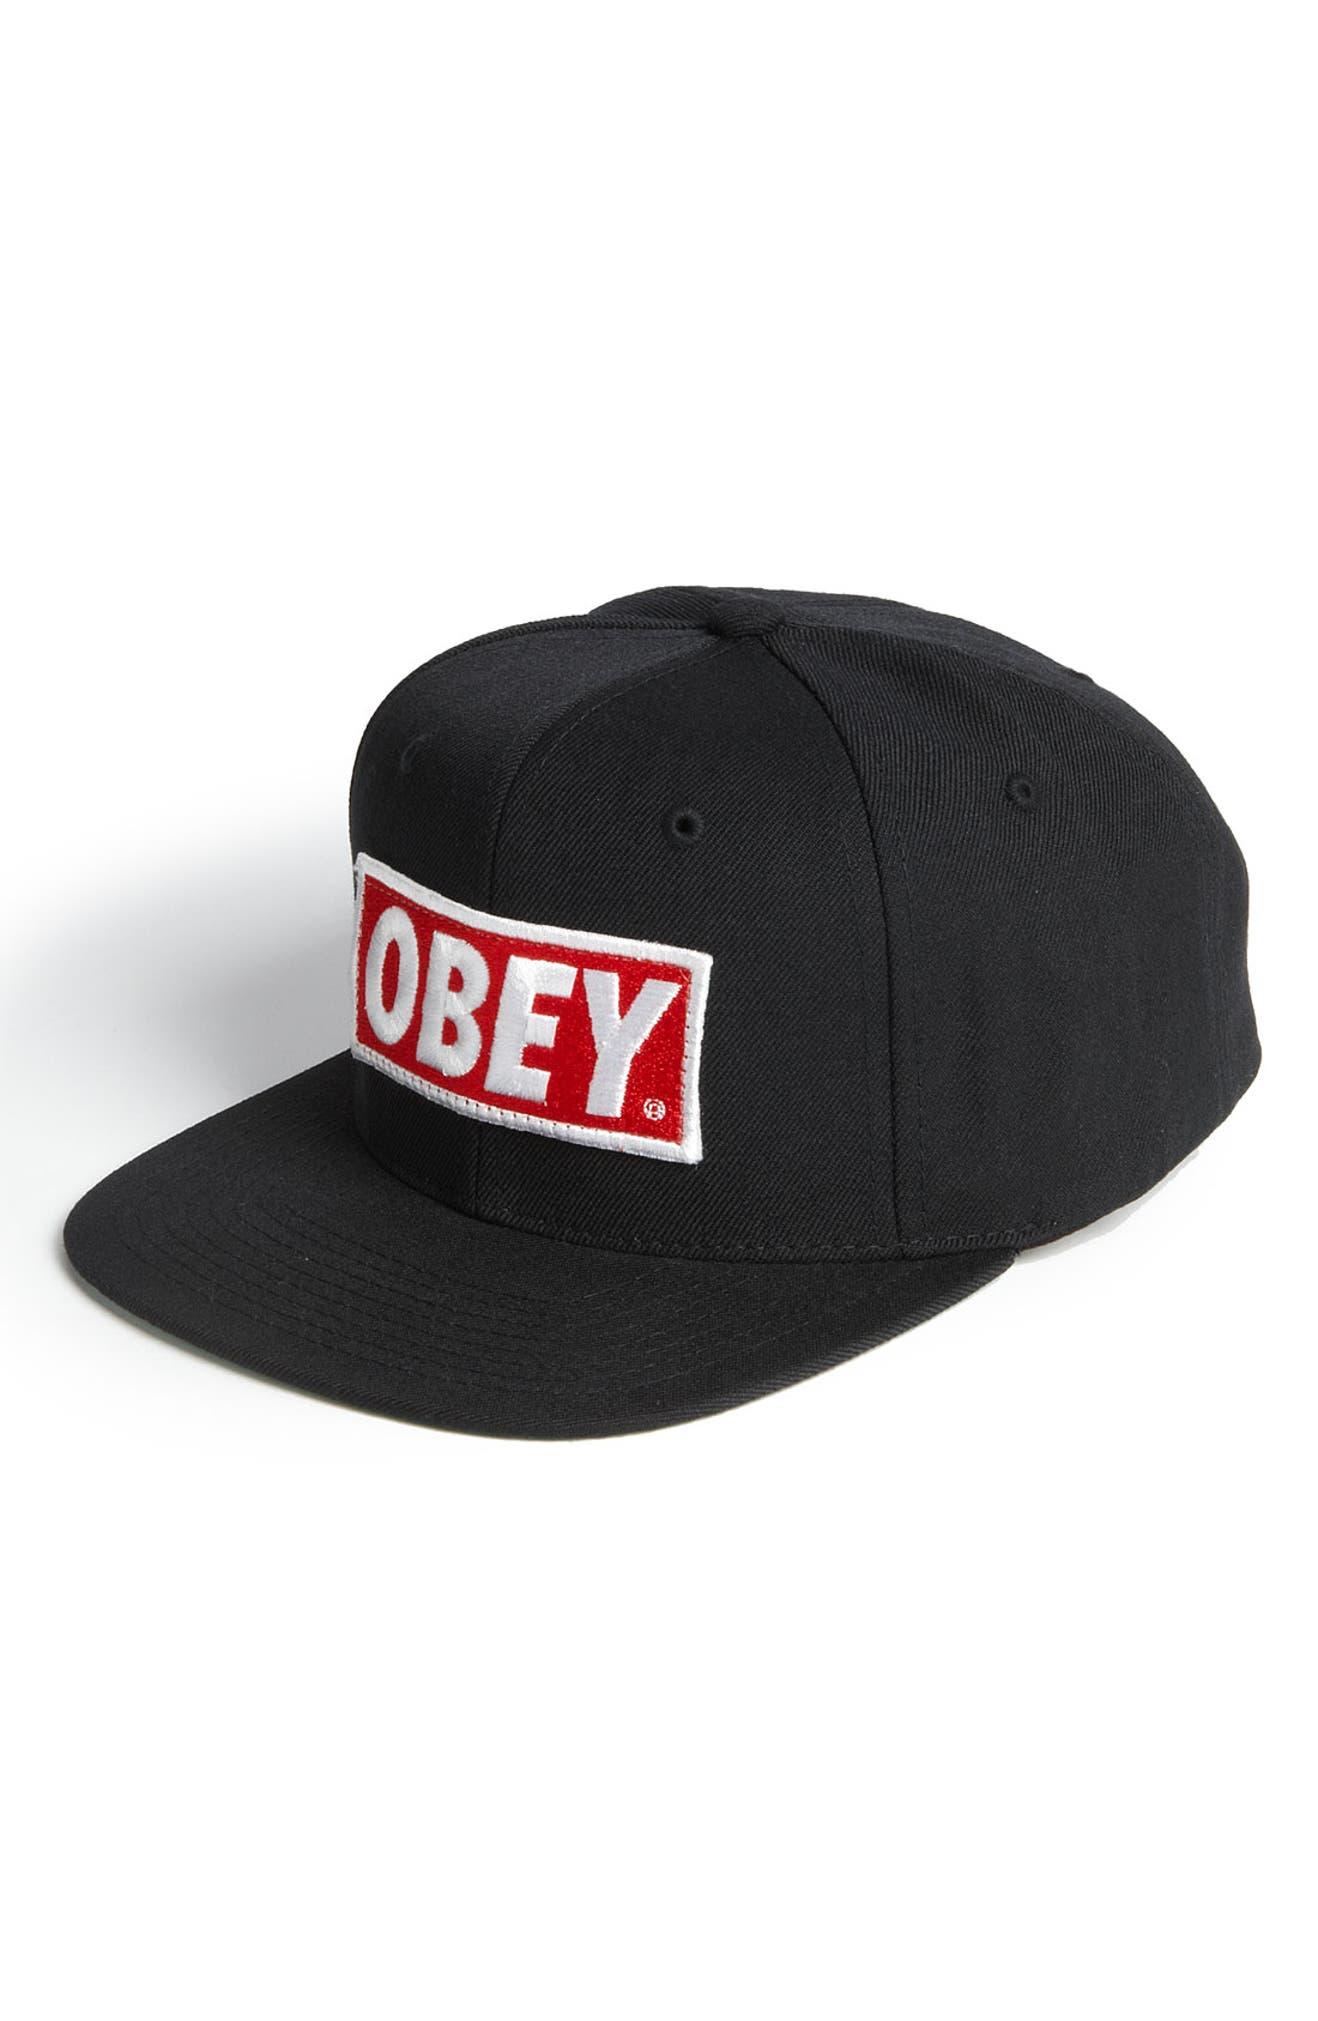 Obey  Original Snapback  Hat  961073dba9d